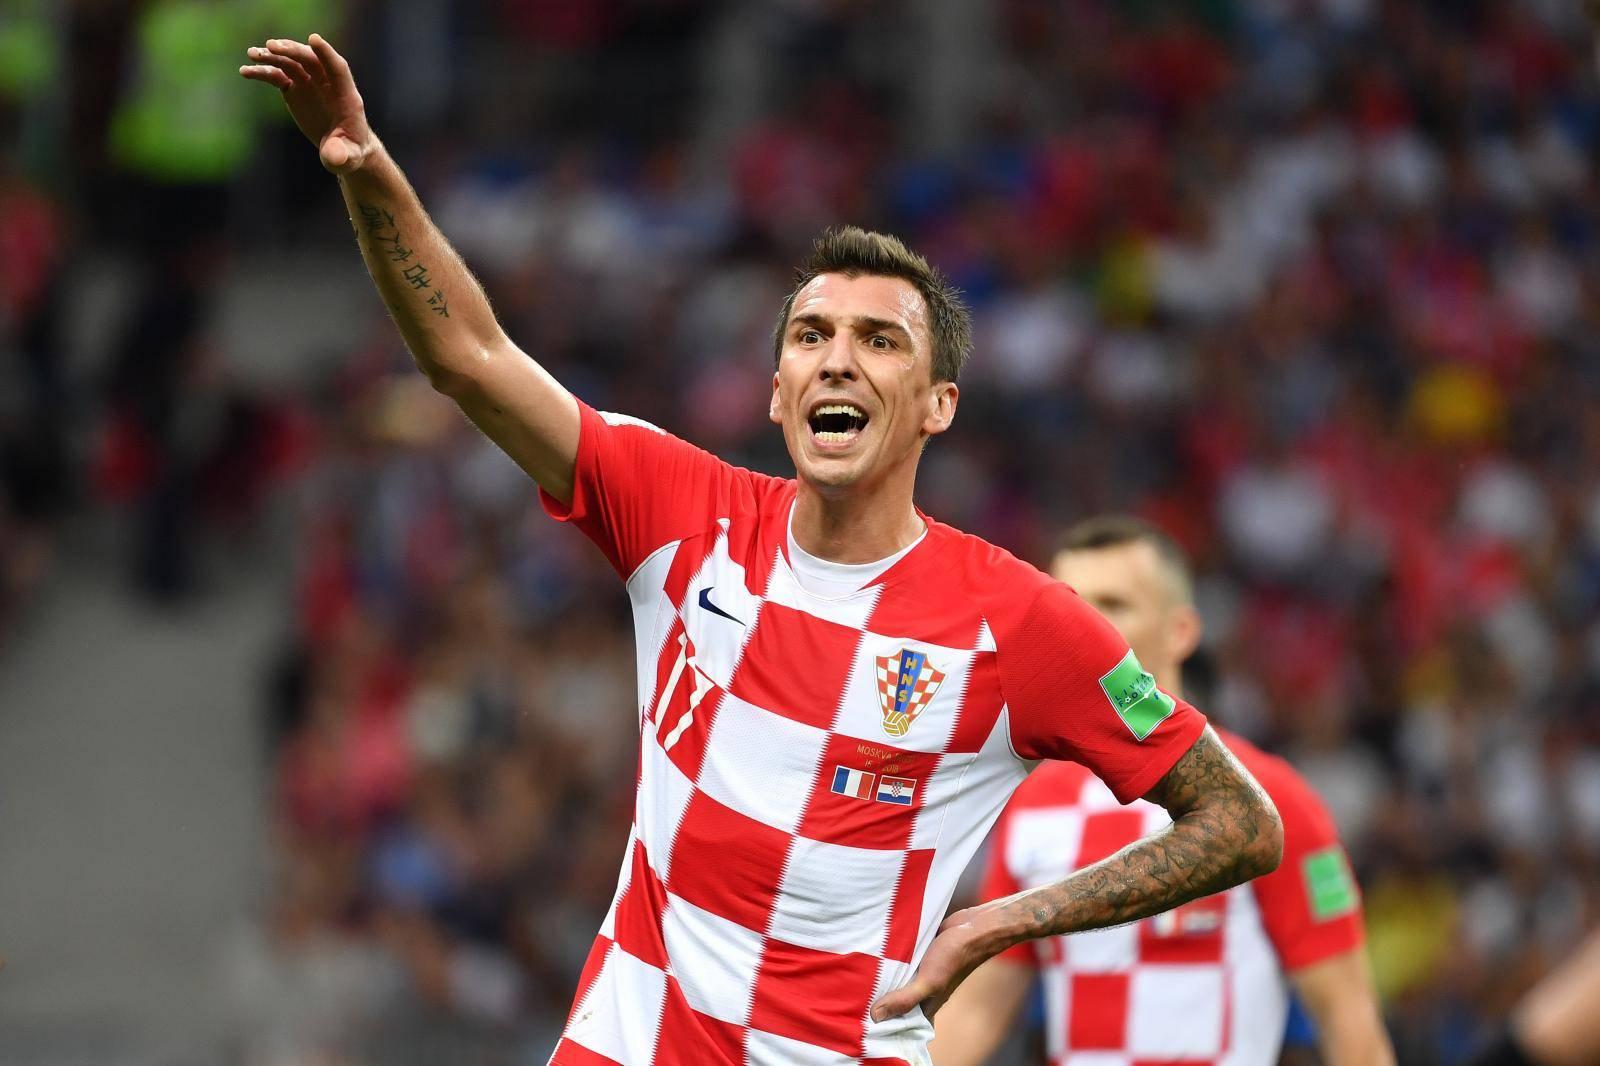 FIFA World Cup 2018 / Final / France - Croatia 4-2.